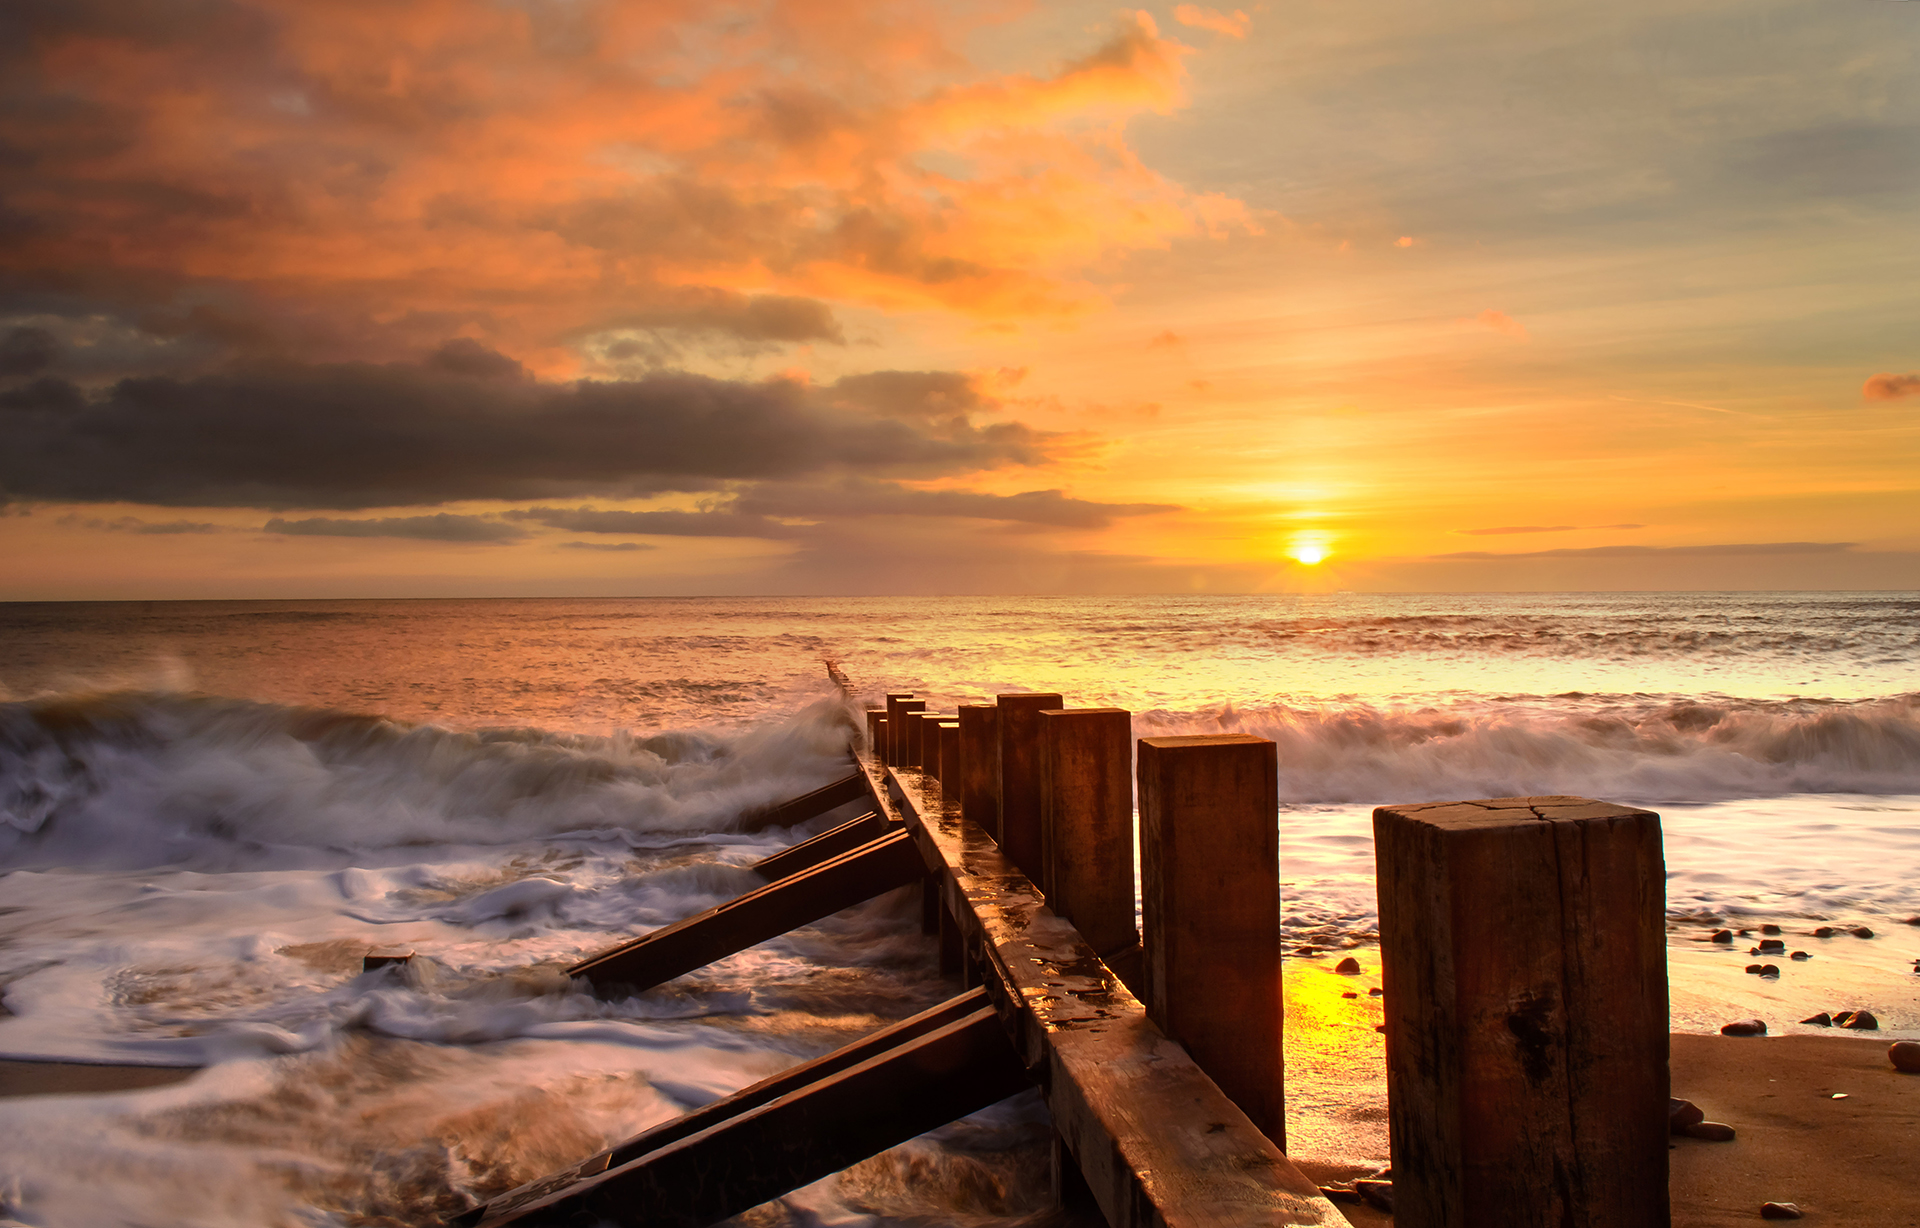 Aberdeen Beach, United Kingdom